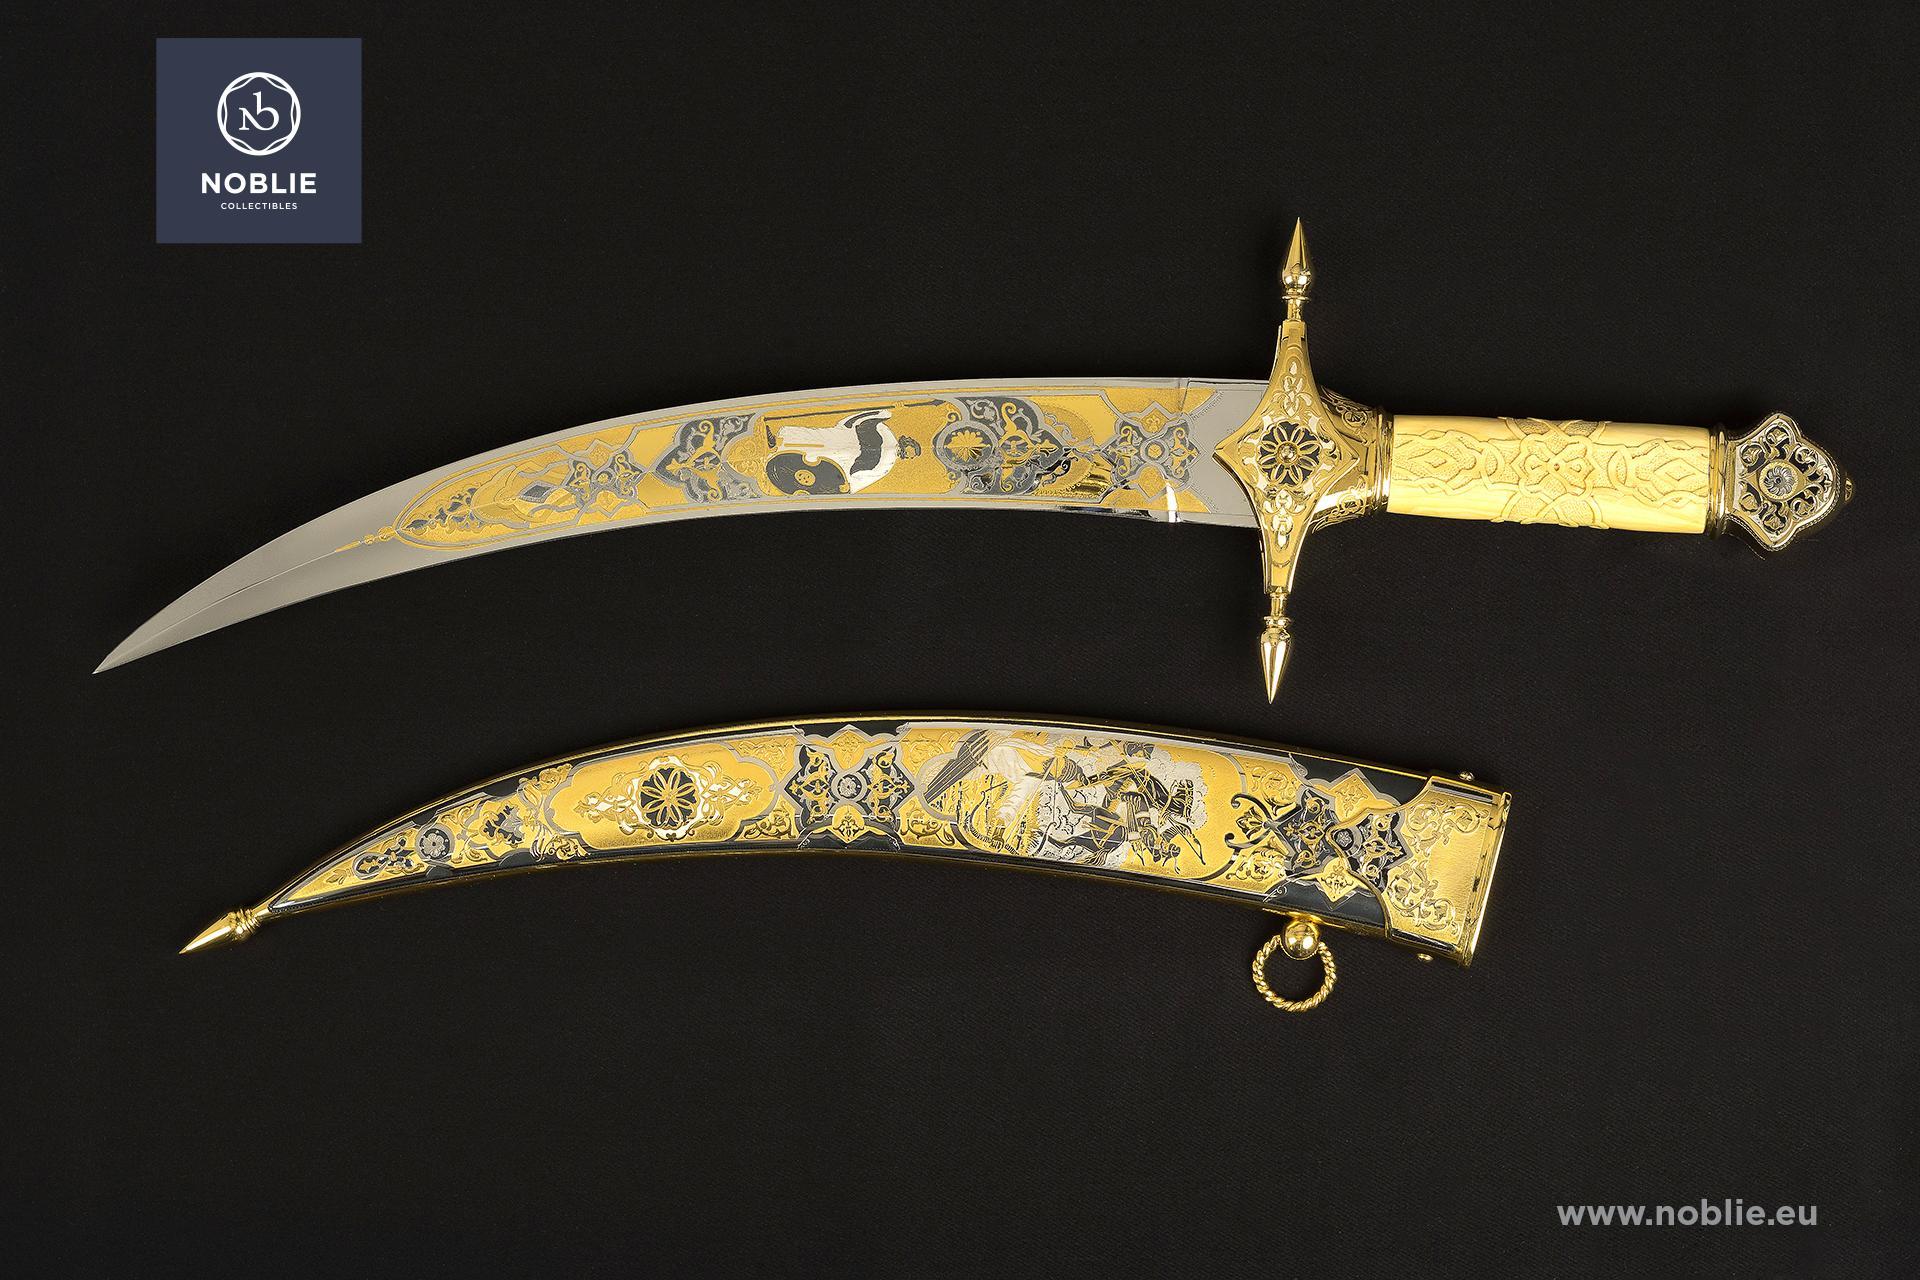 handmade daggers